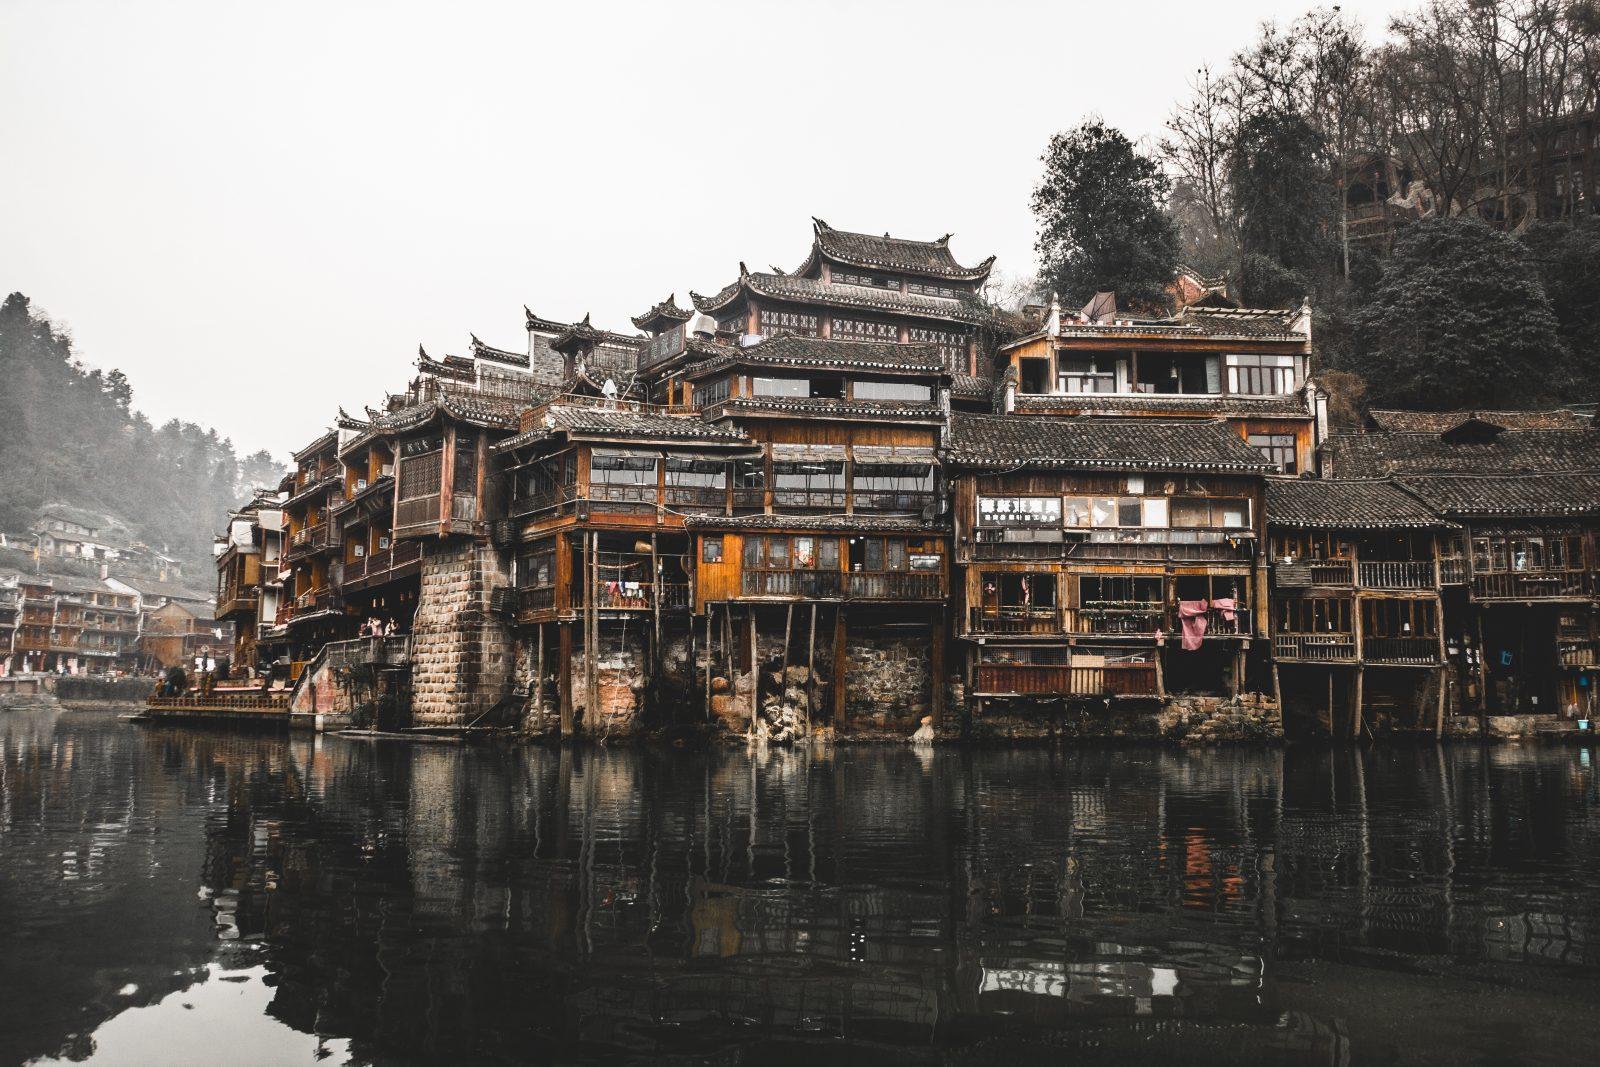 Guía de Fenghuang